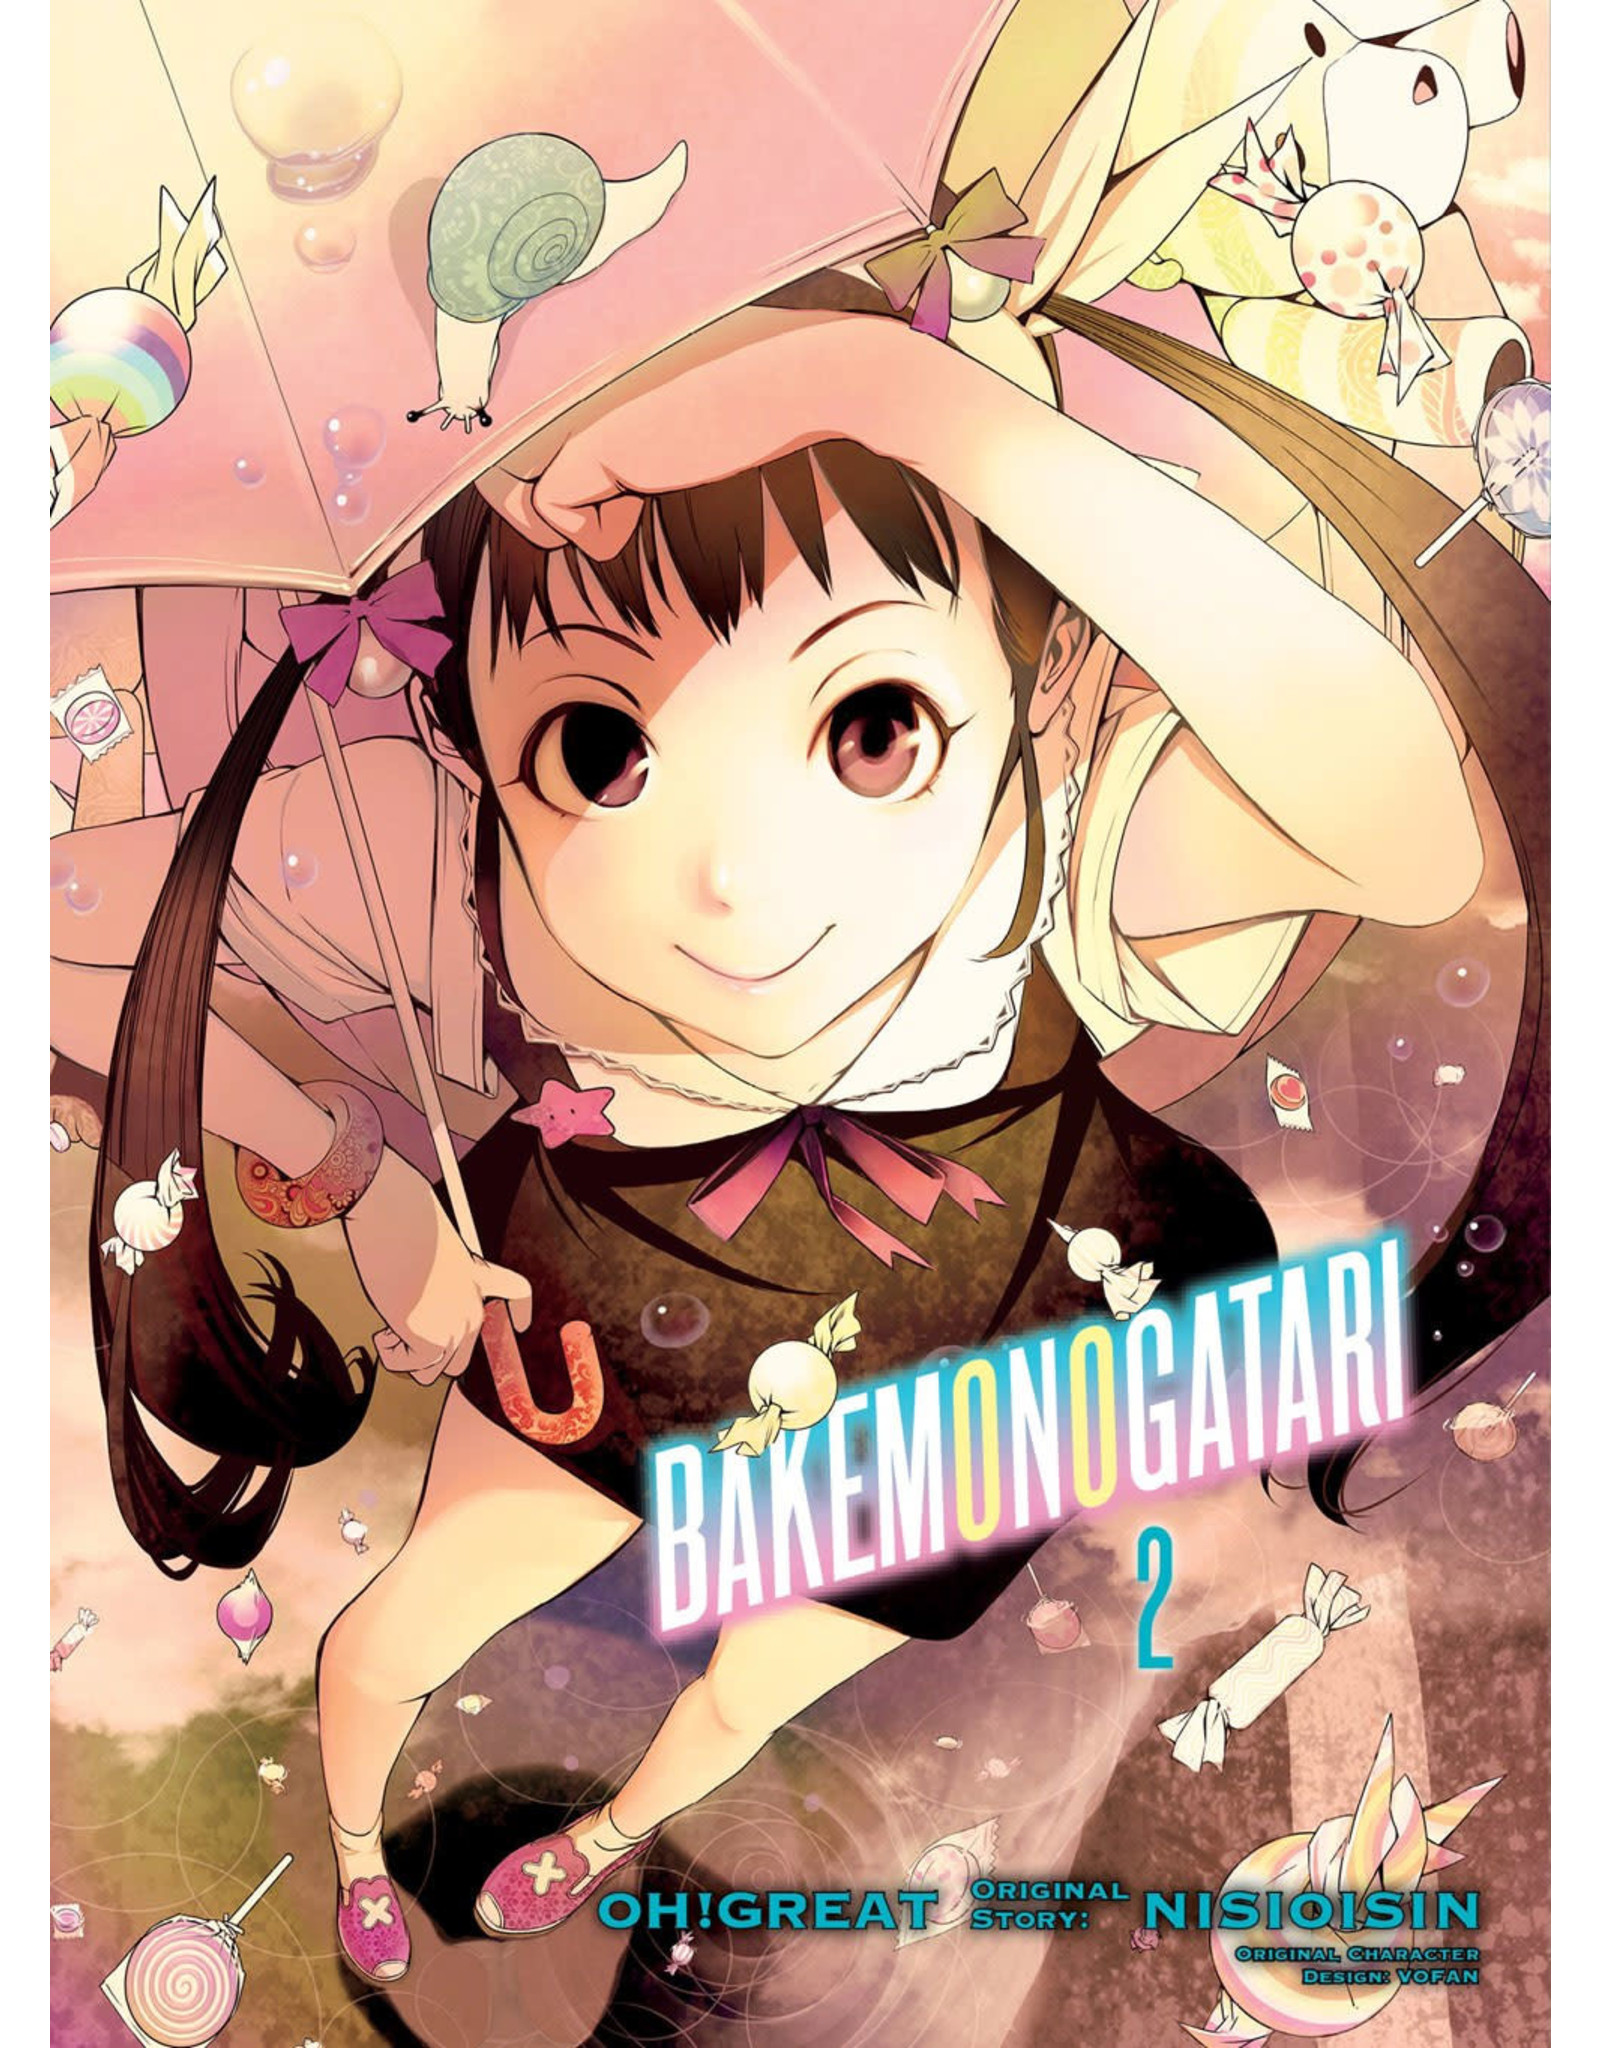 Bakemonogatari 2 (Engelstalig) - Manga